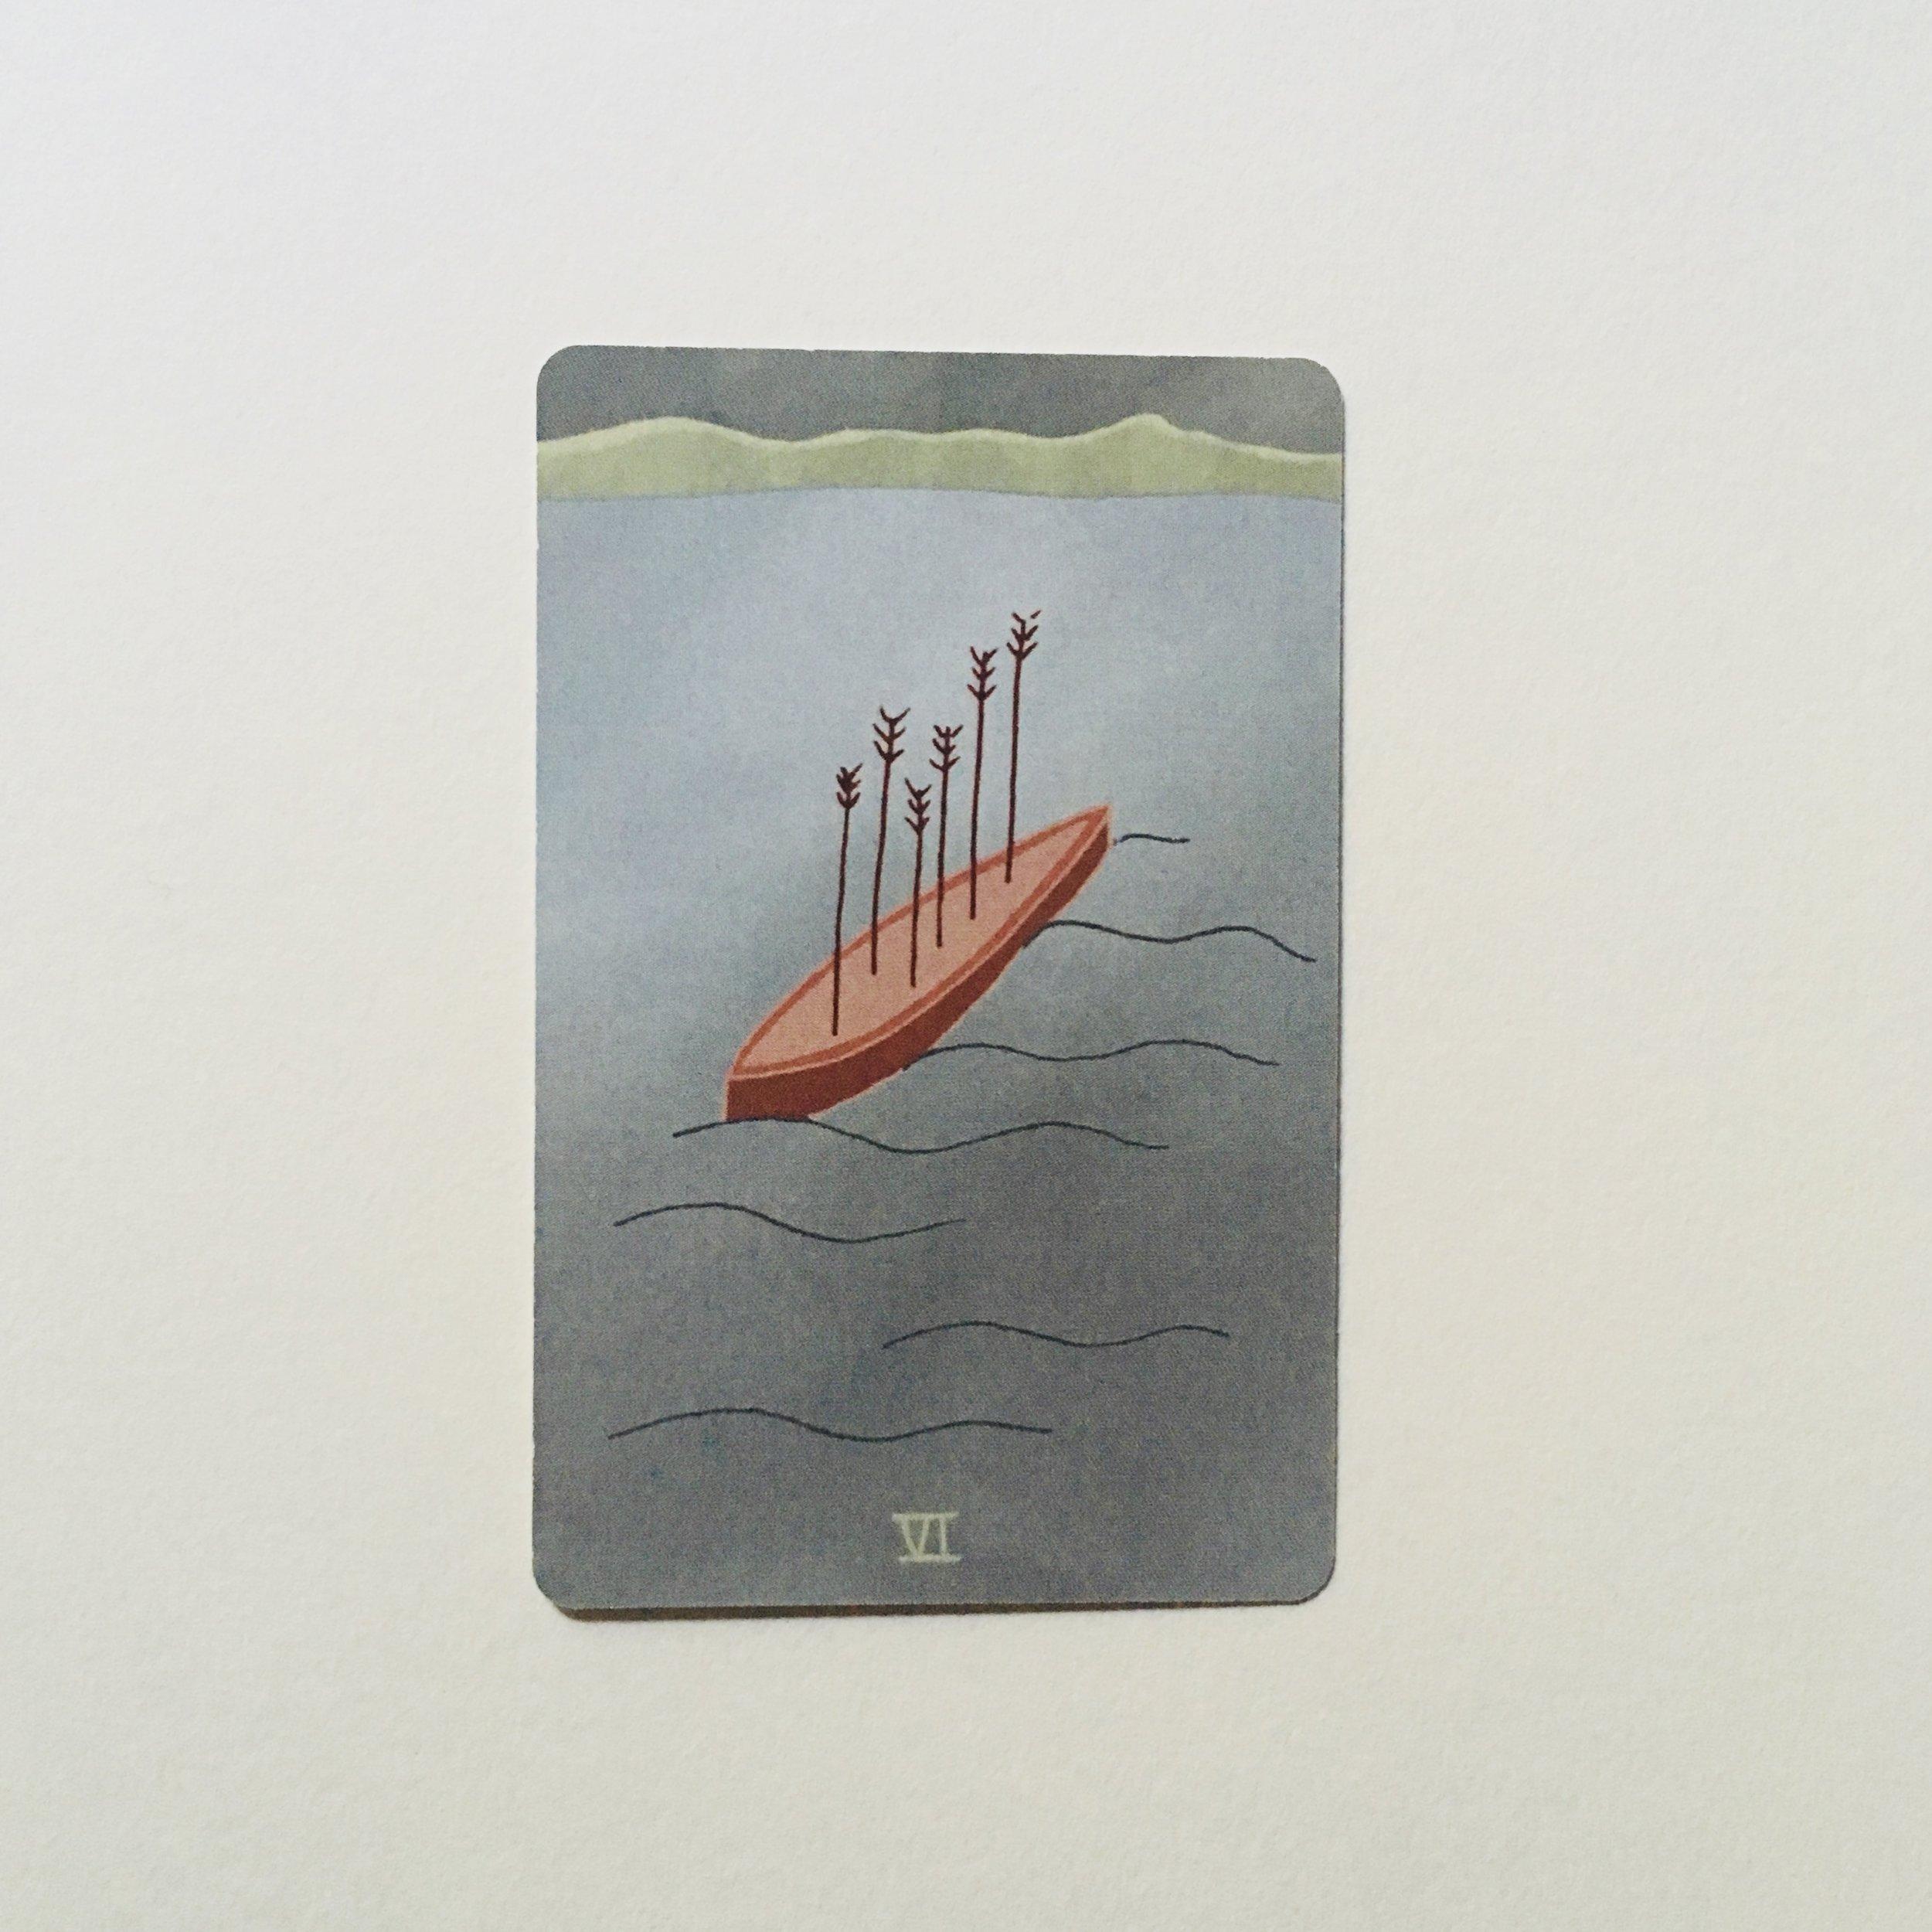 Six of Arrows, Mesquite Tarot